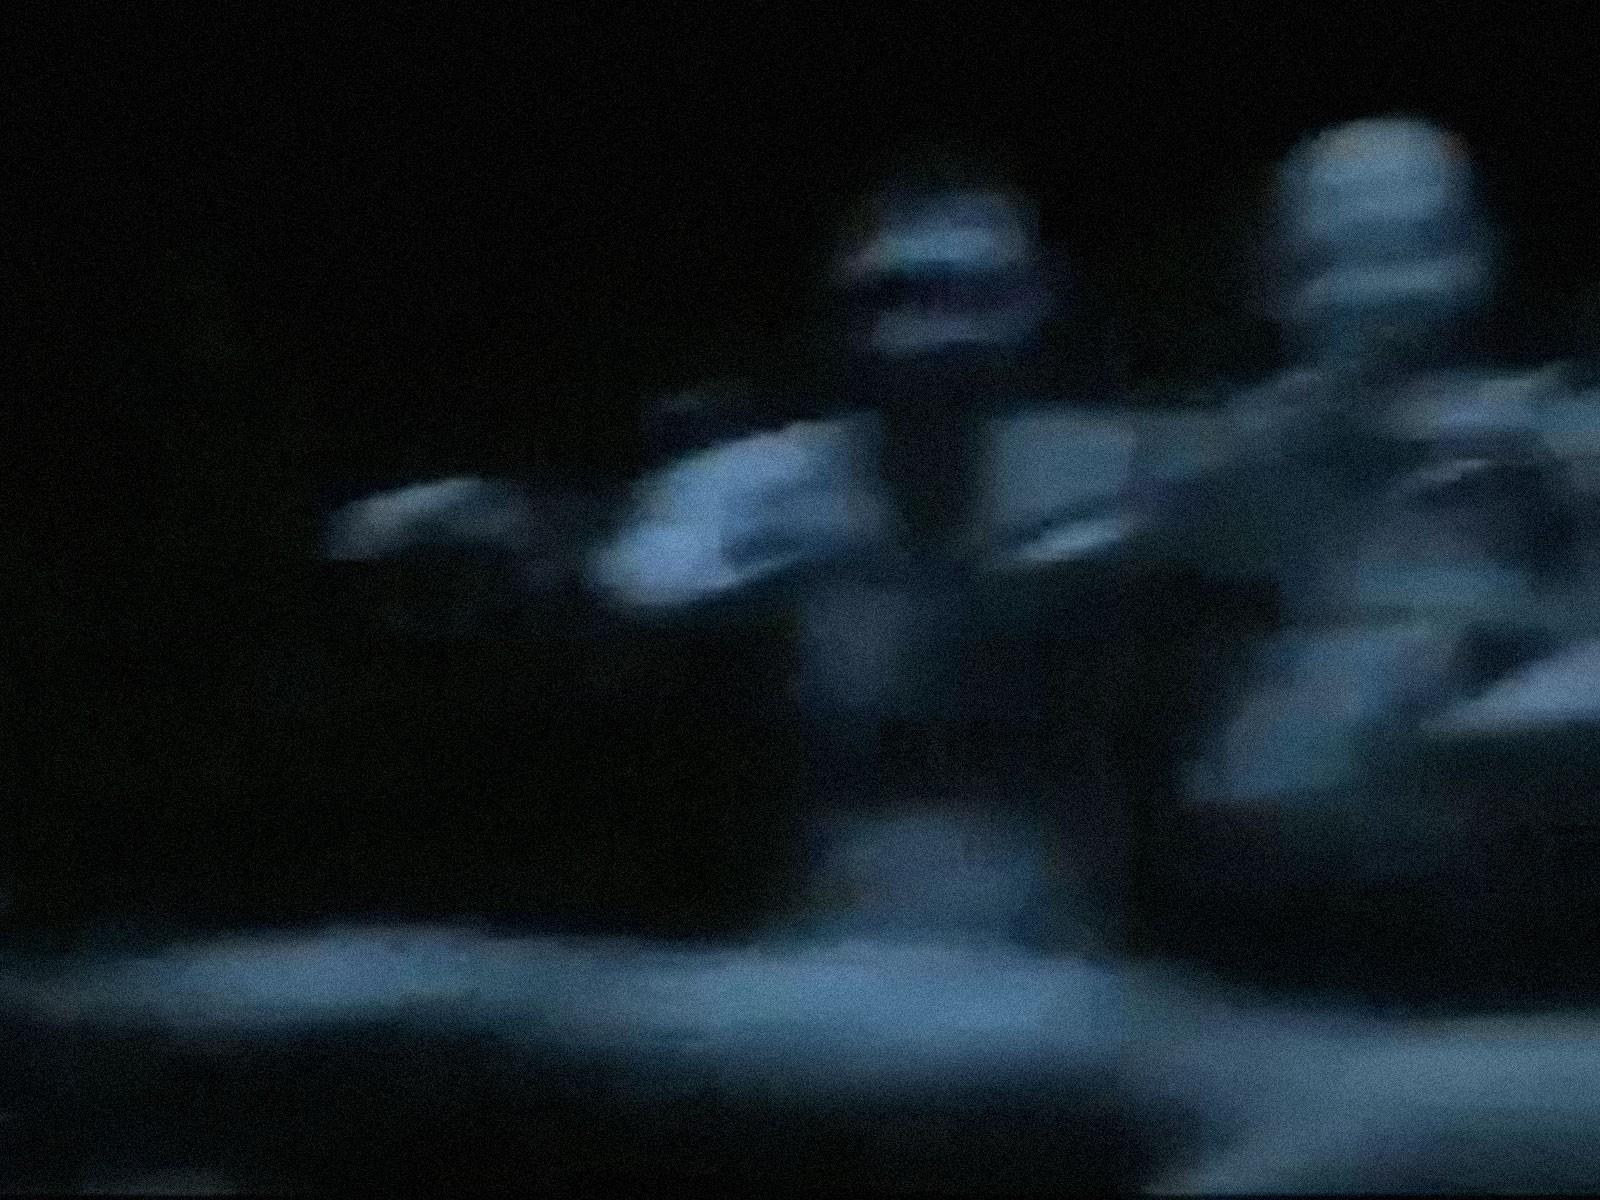 Wallpaper del film Pulse, remake del giapponese Kairo